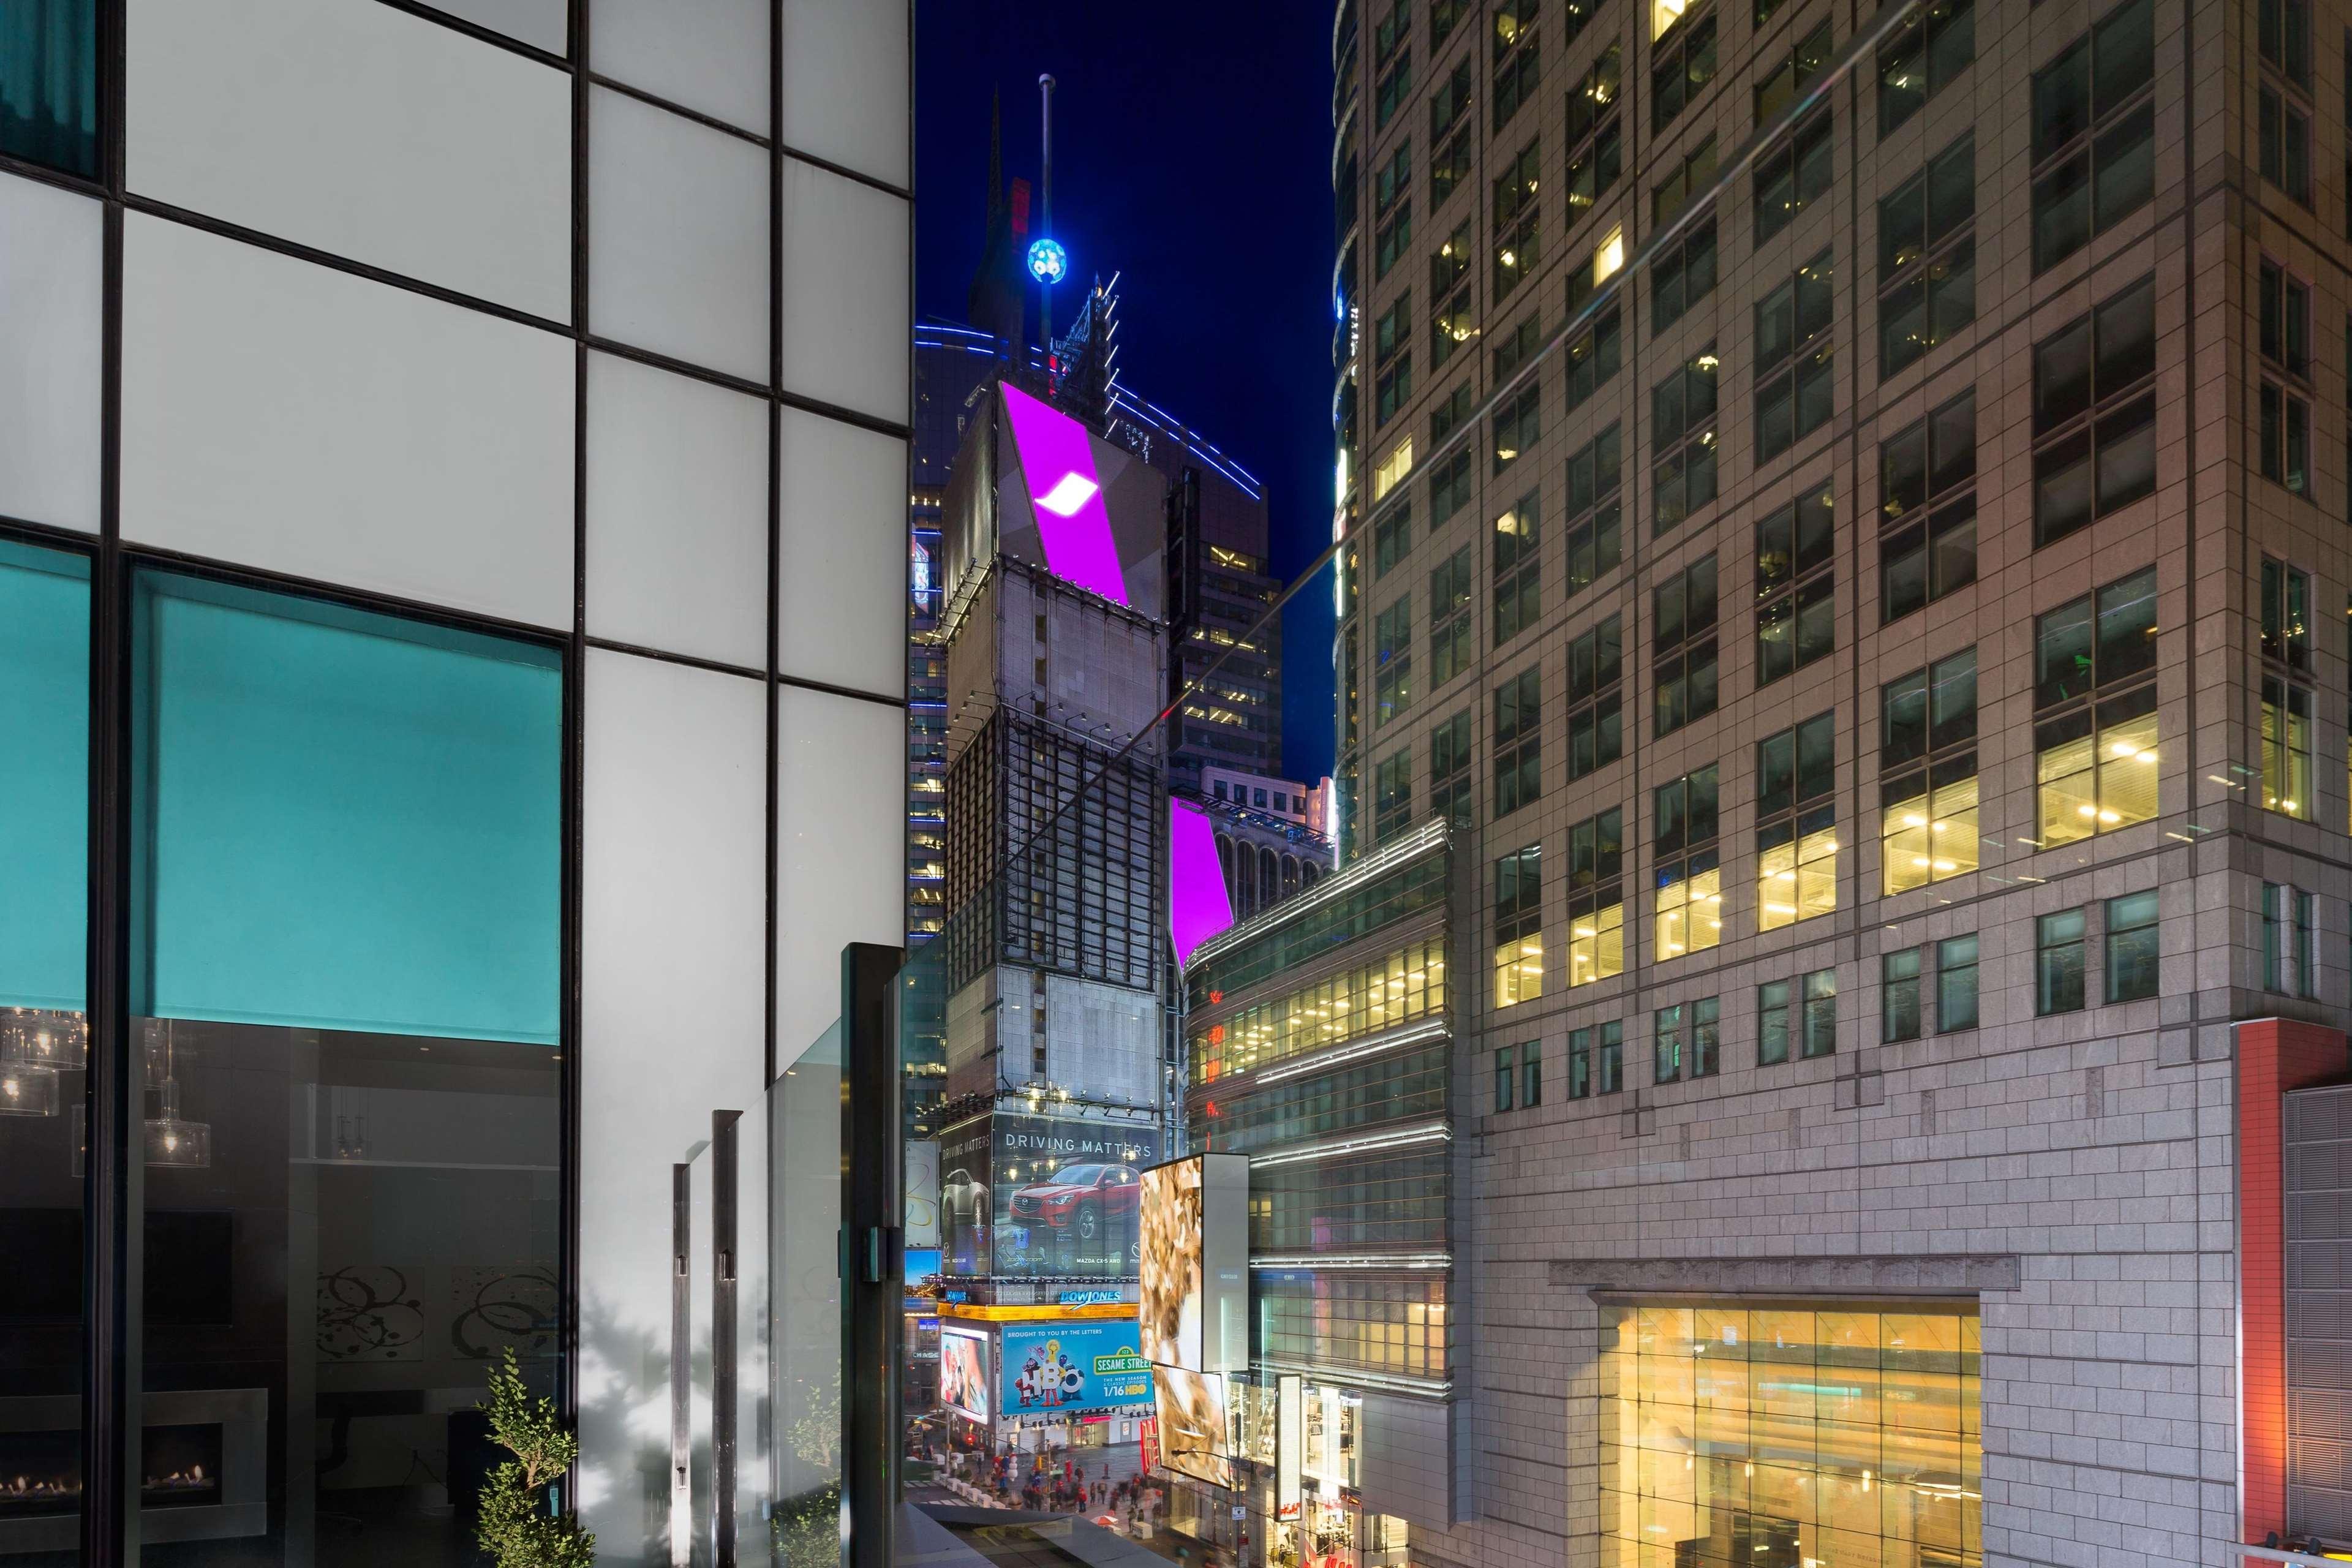 Hilton Garden Inn New York Times Square Central In New York Ny 10036